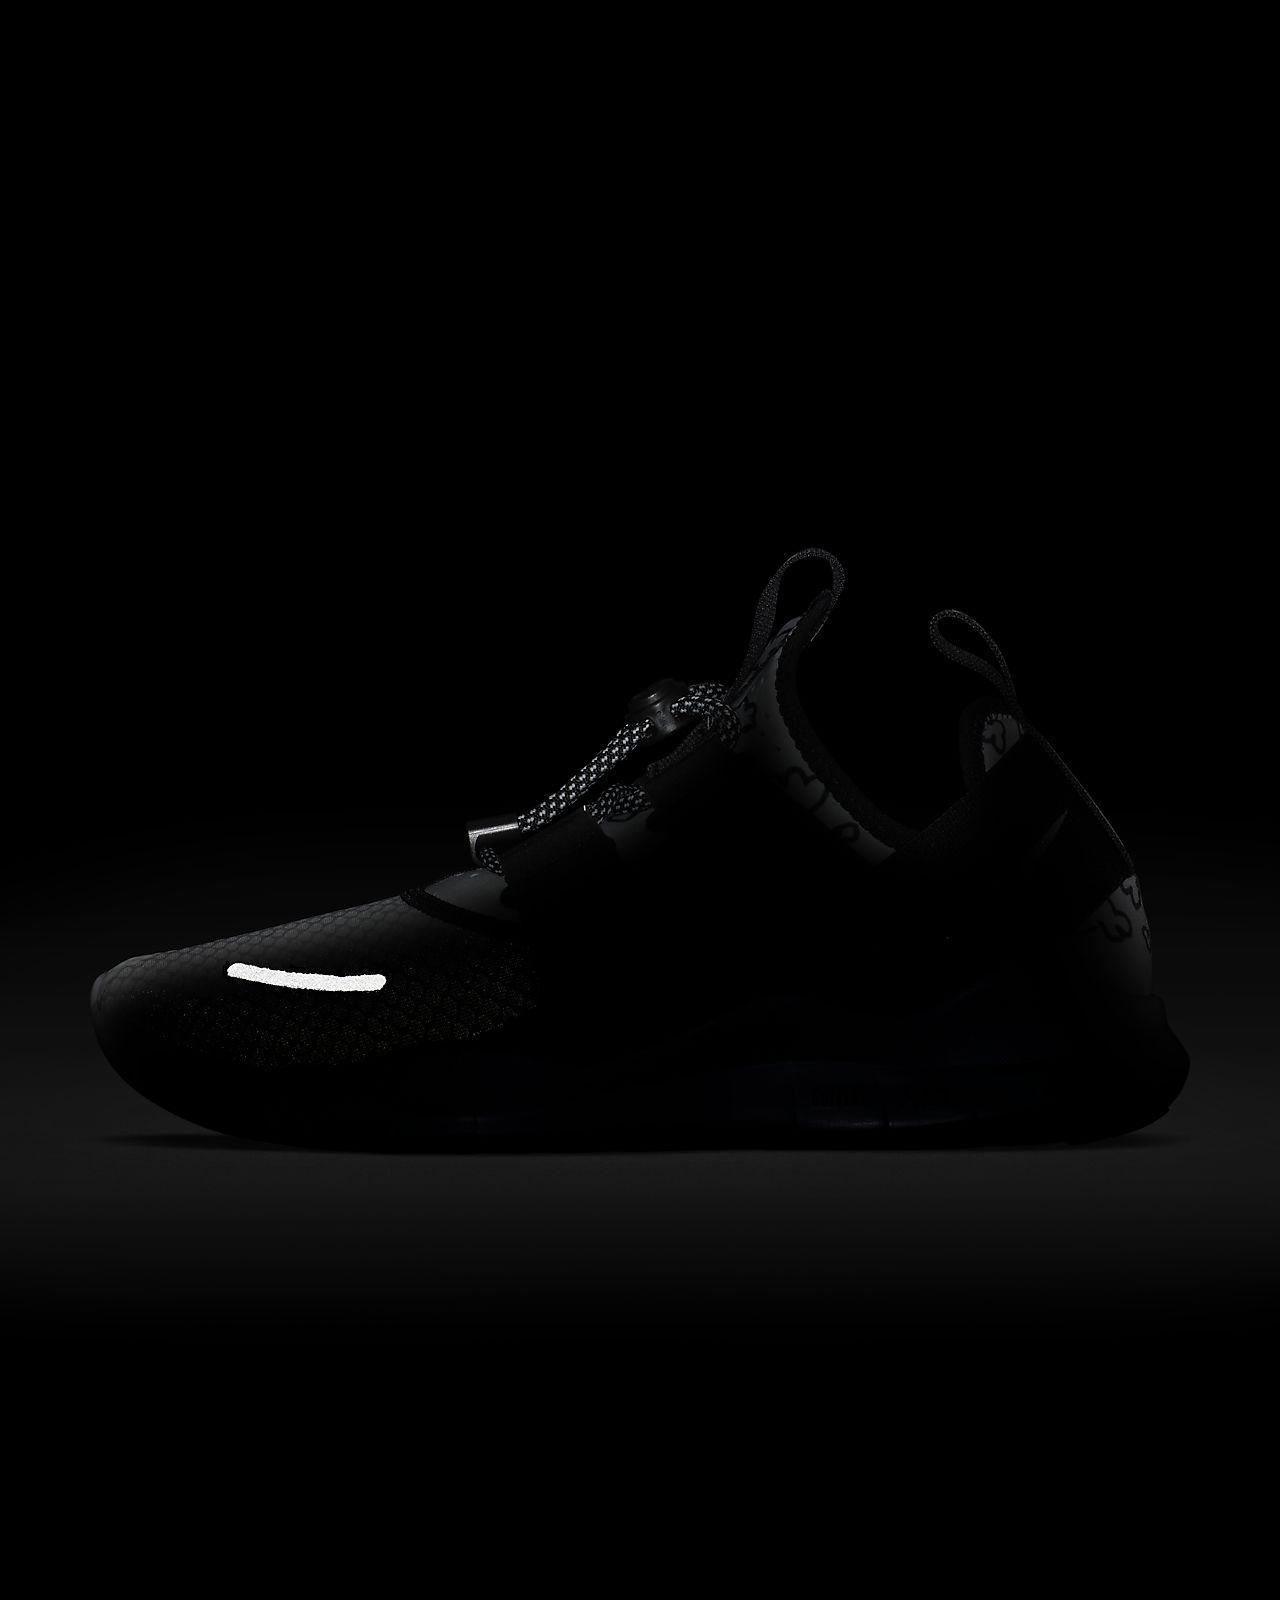 fe2cc99d0ec Nike Free RN Commuter 2018 Nathan Bell Men s Running Shoe. Nike.com ID